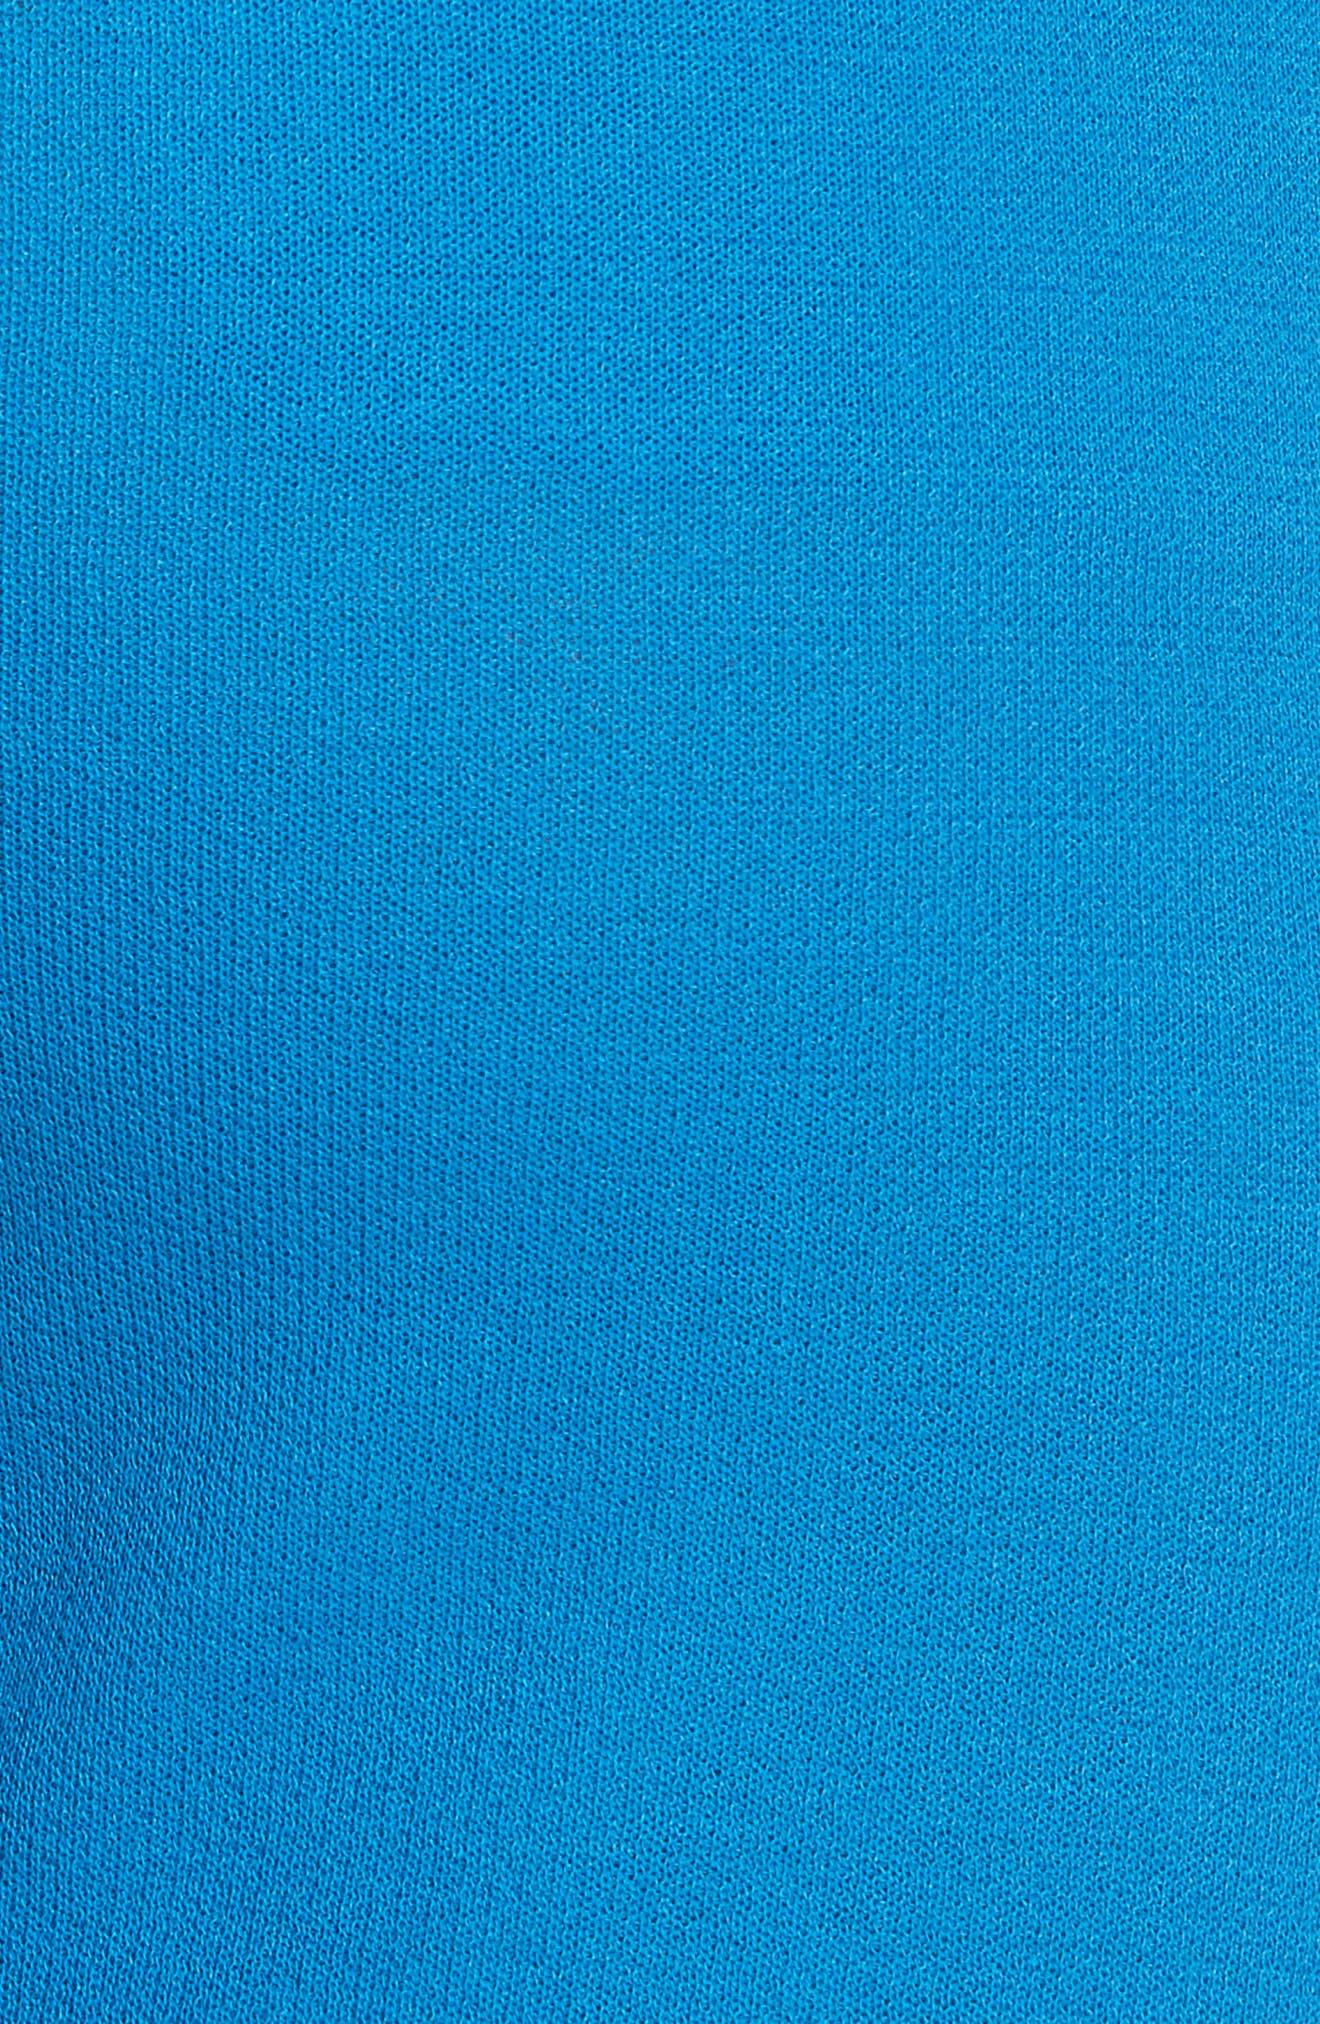 Isabel Marant Étoile Dobbs Pants,                             Alternate thumbnail 6, color,                             Electric Blue